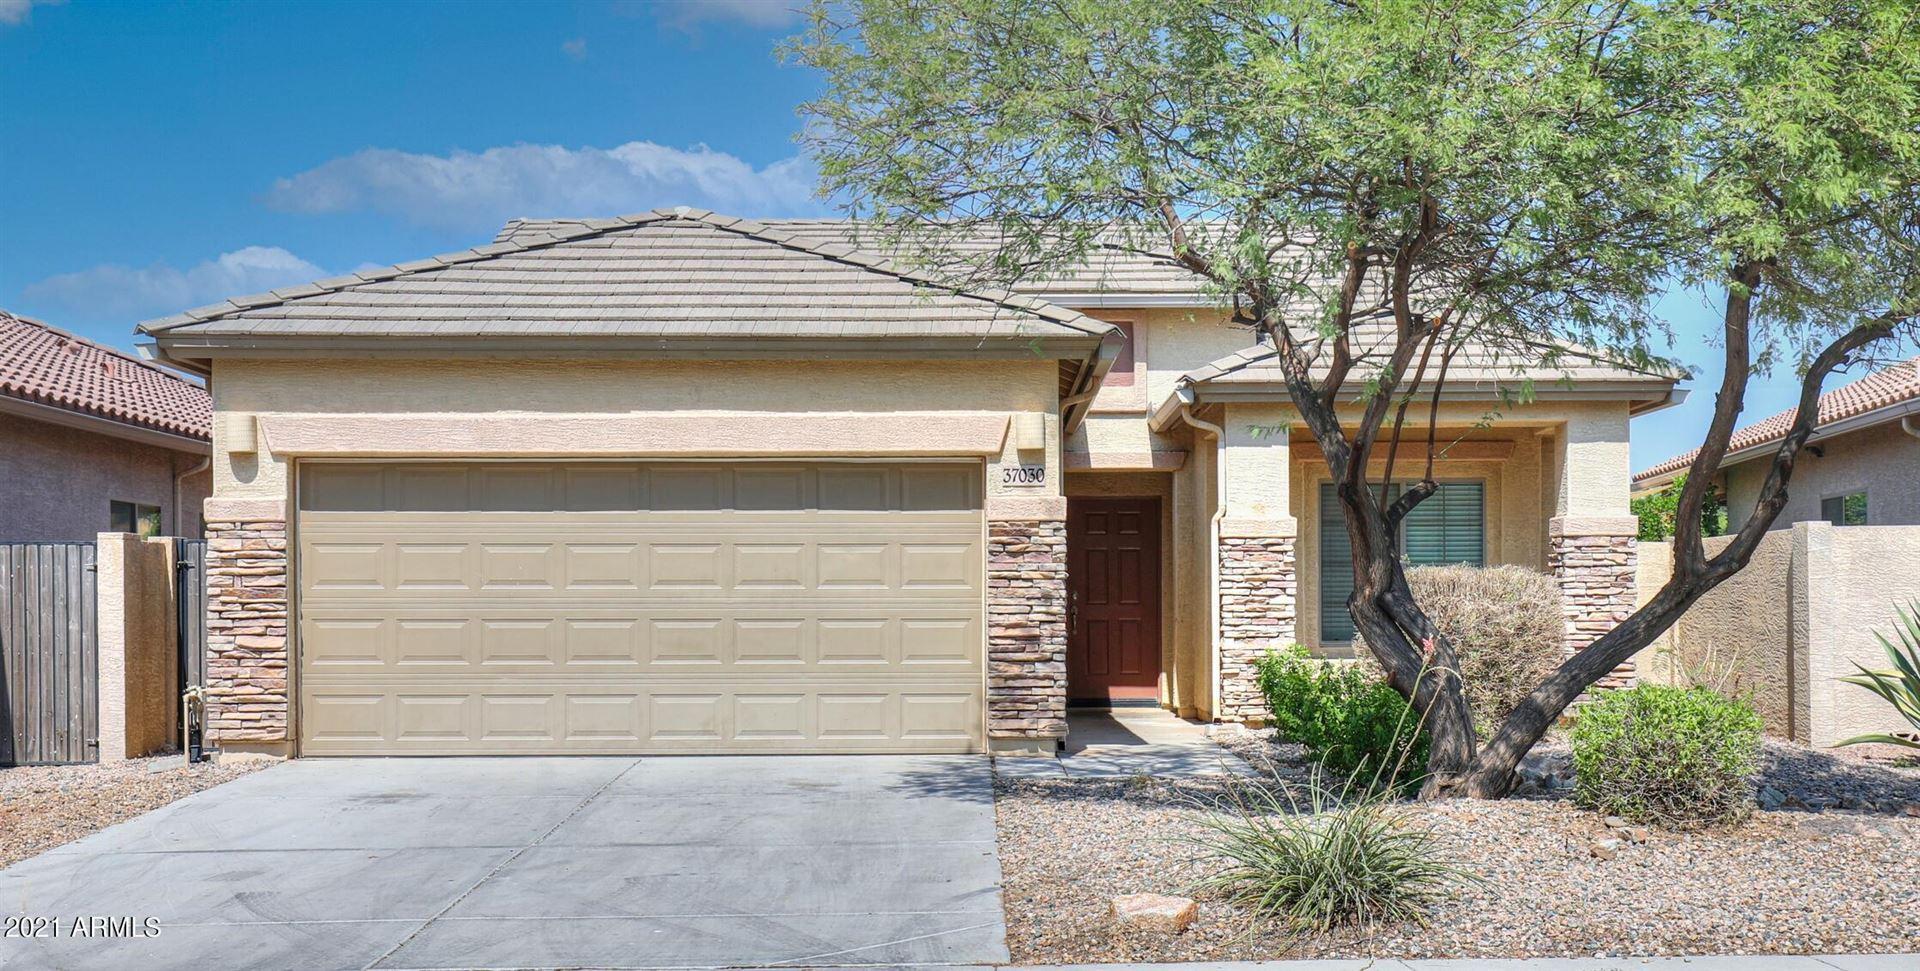 Photo of 37030 W MONDRAGONE Lane, Maricopa, AZ 85138 (MLS # 6295022)